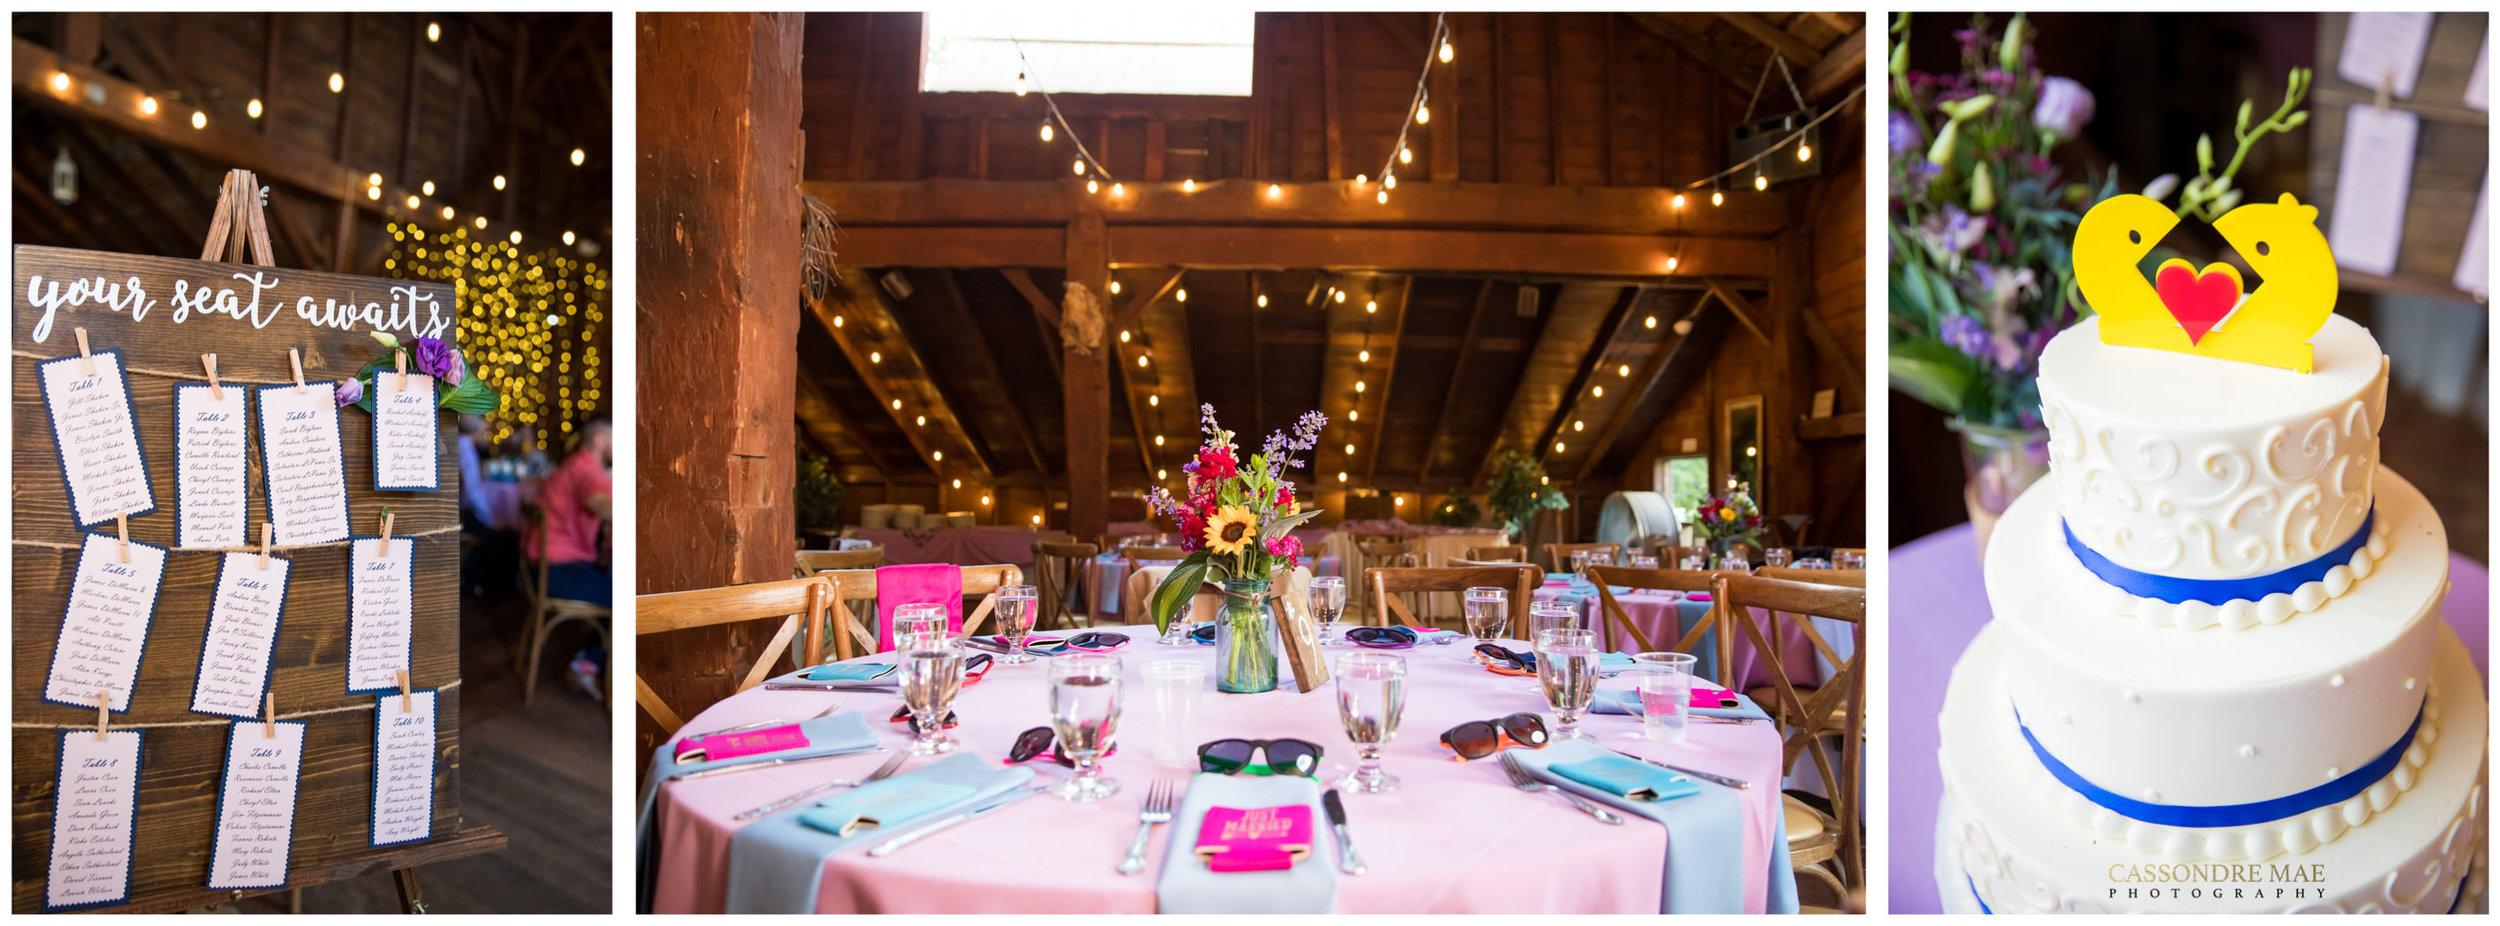 Cassondre Mae Photography hudson valley barn weddings -14.jpg